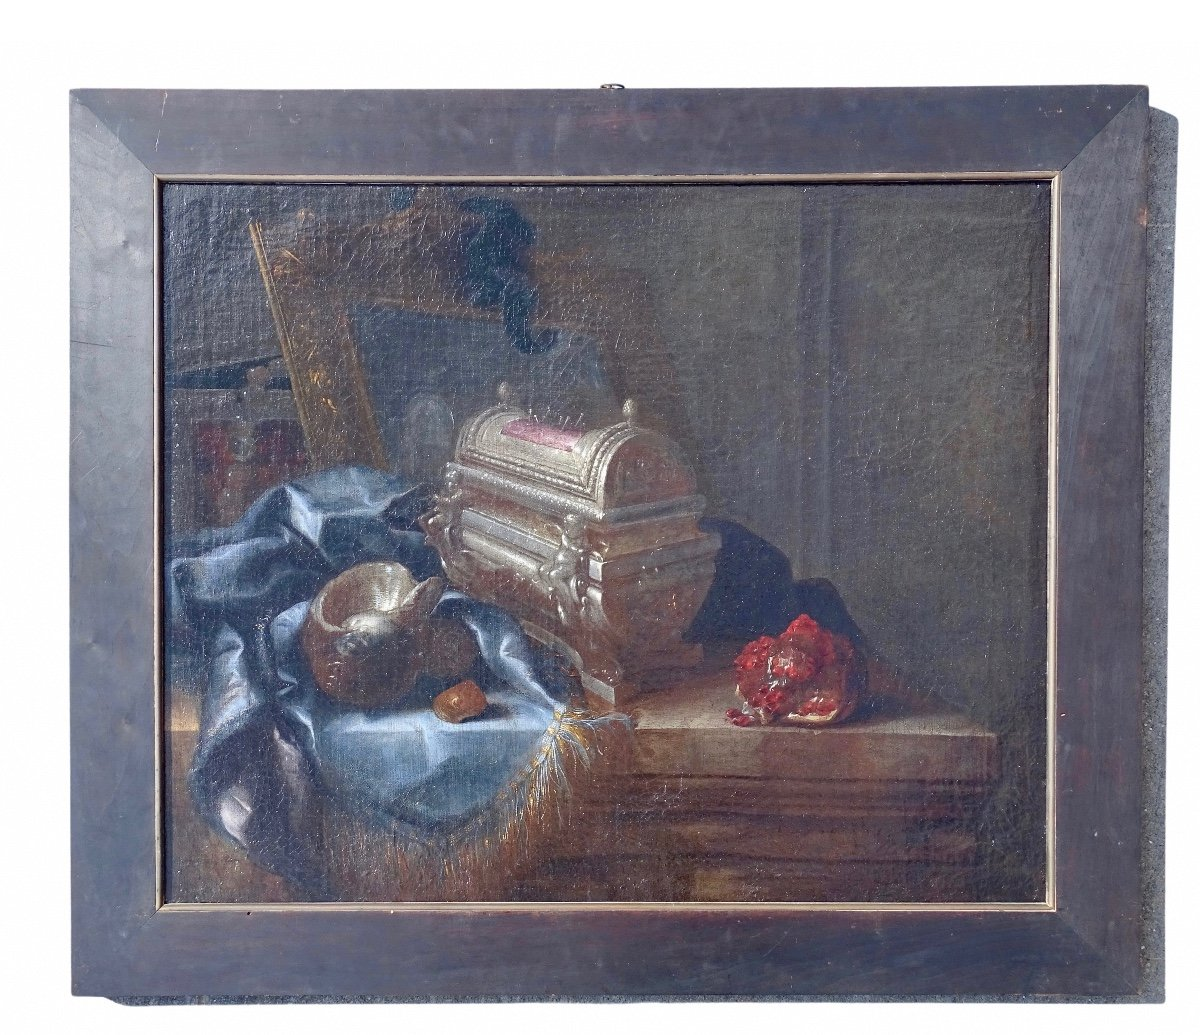 Meiffren Comte (marseille, 1630 - Marseille, 12 Marzo 1705), Still Life